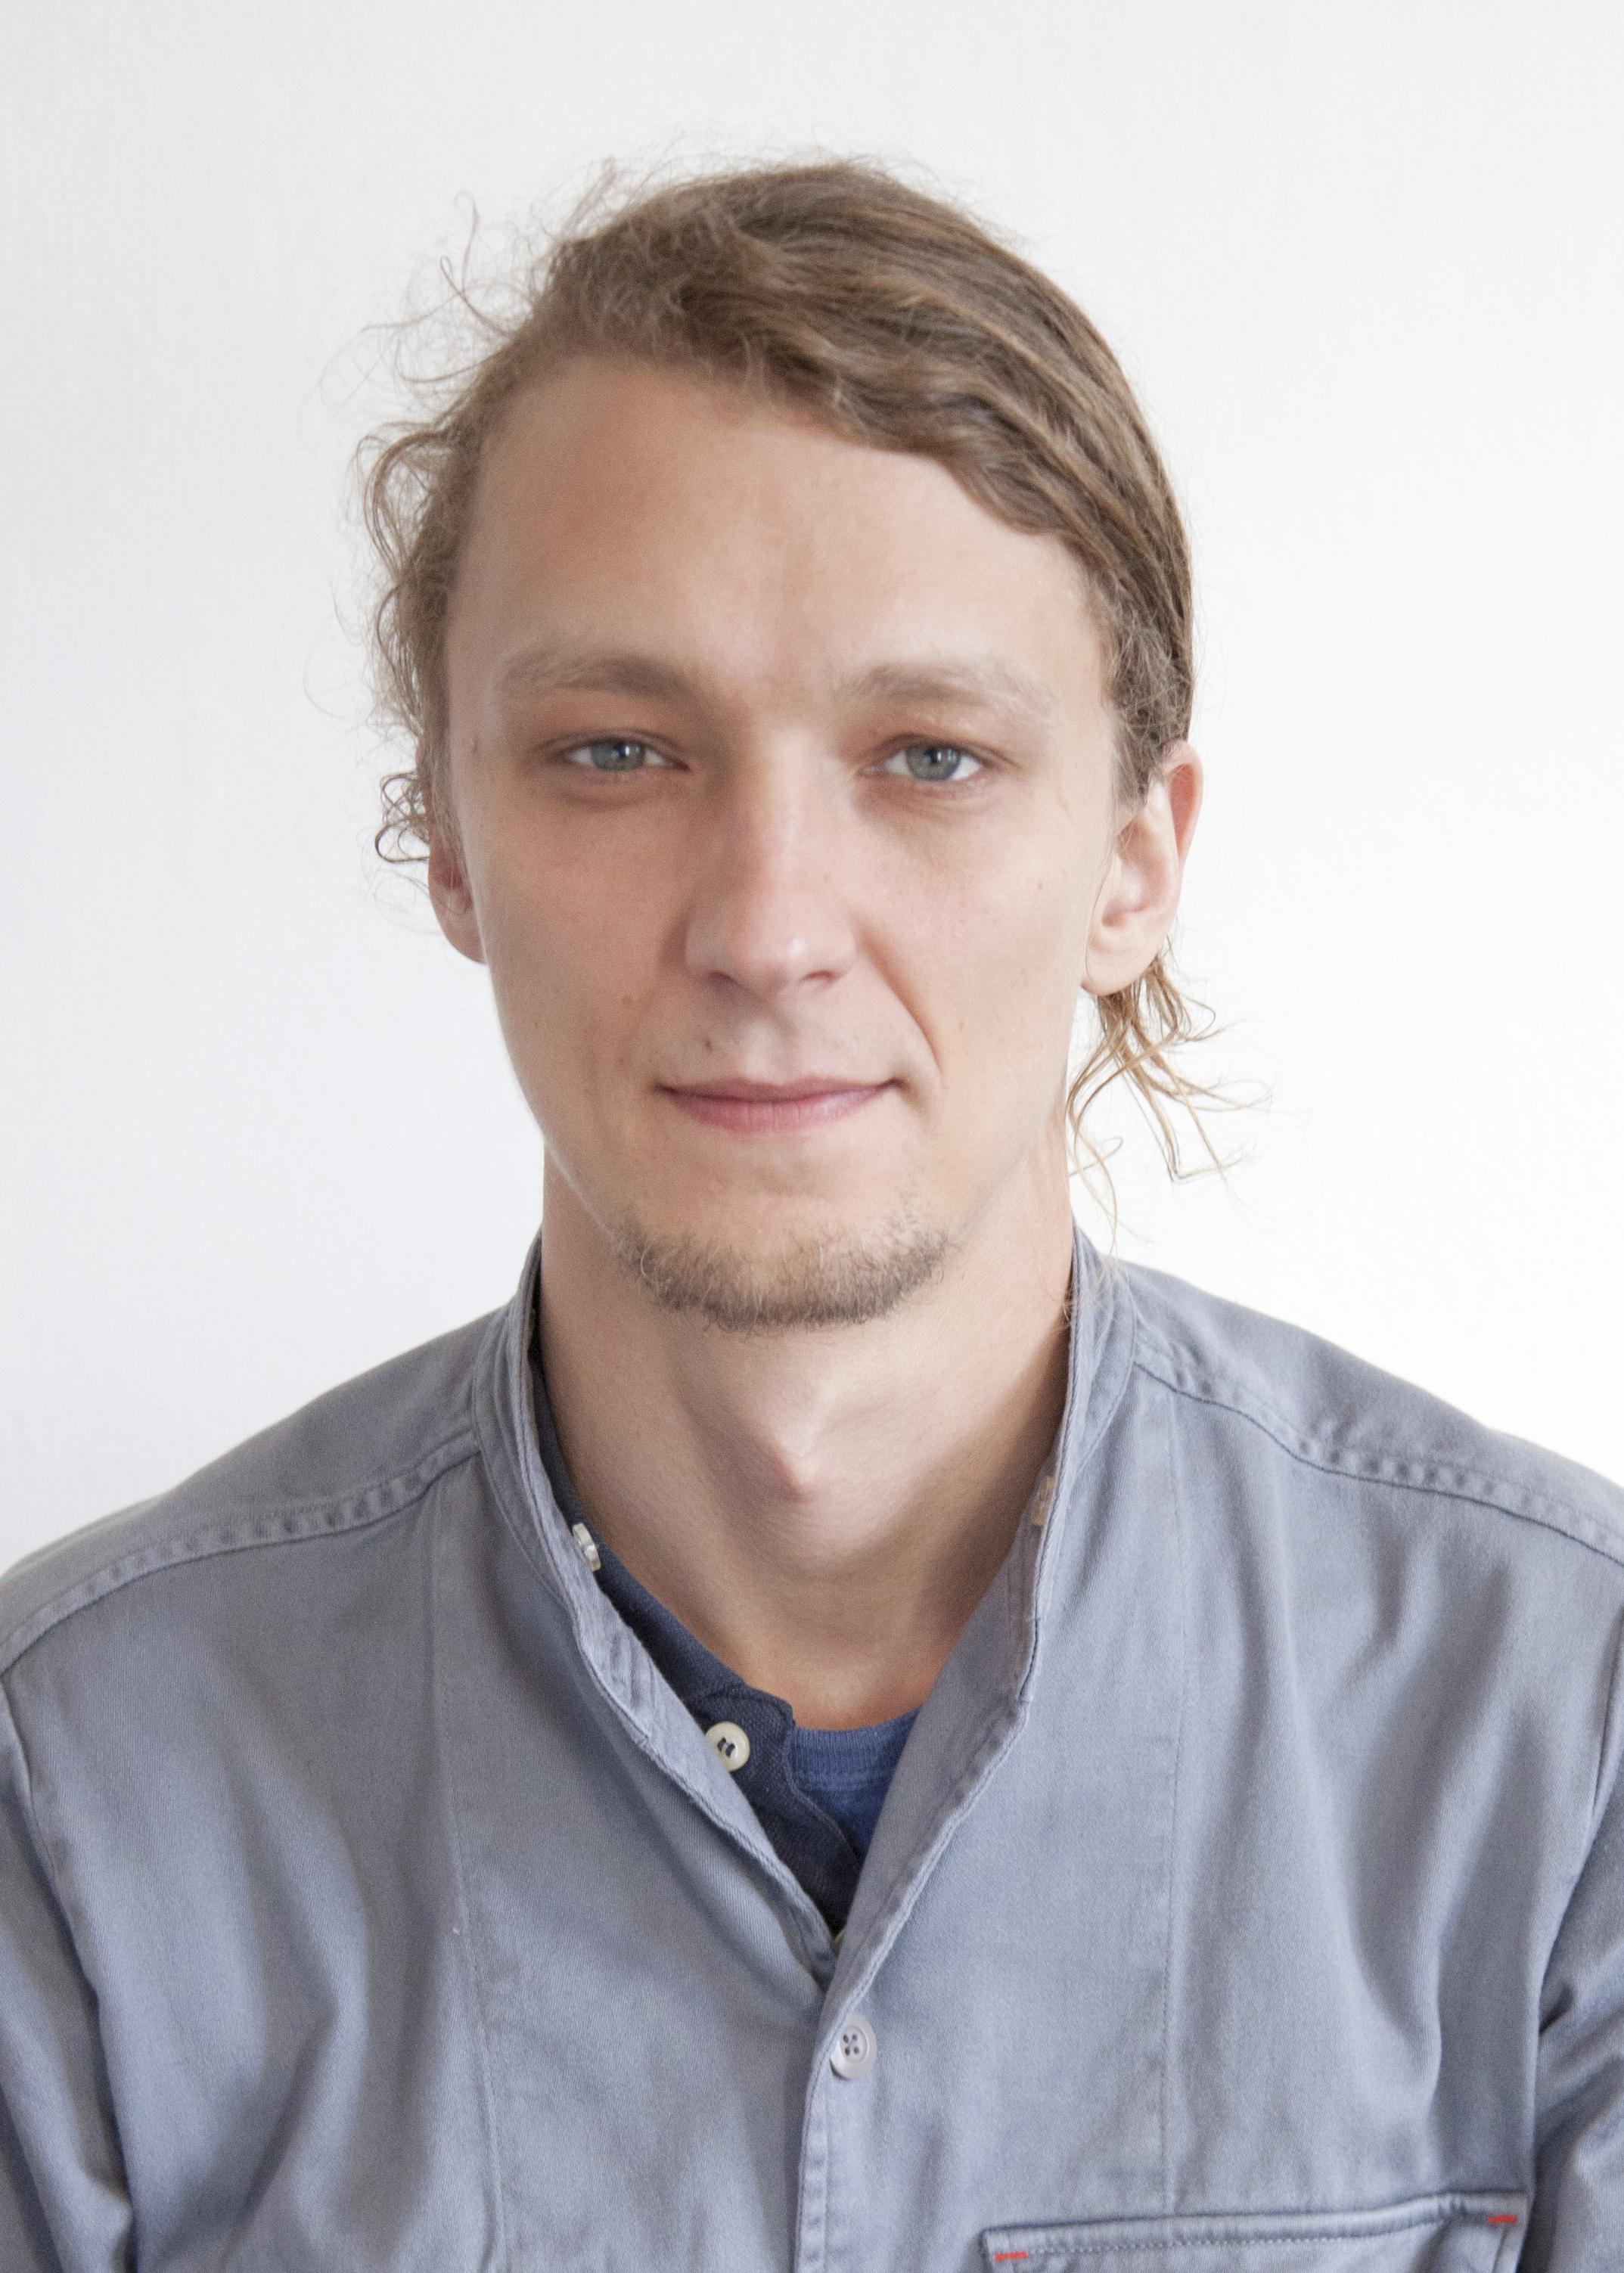 Jan Franciszek Kowalski